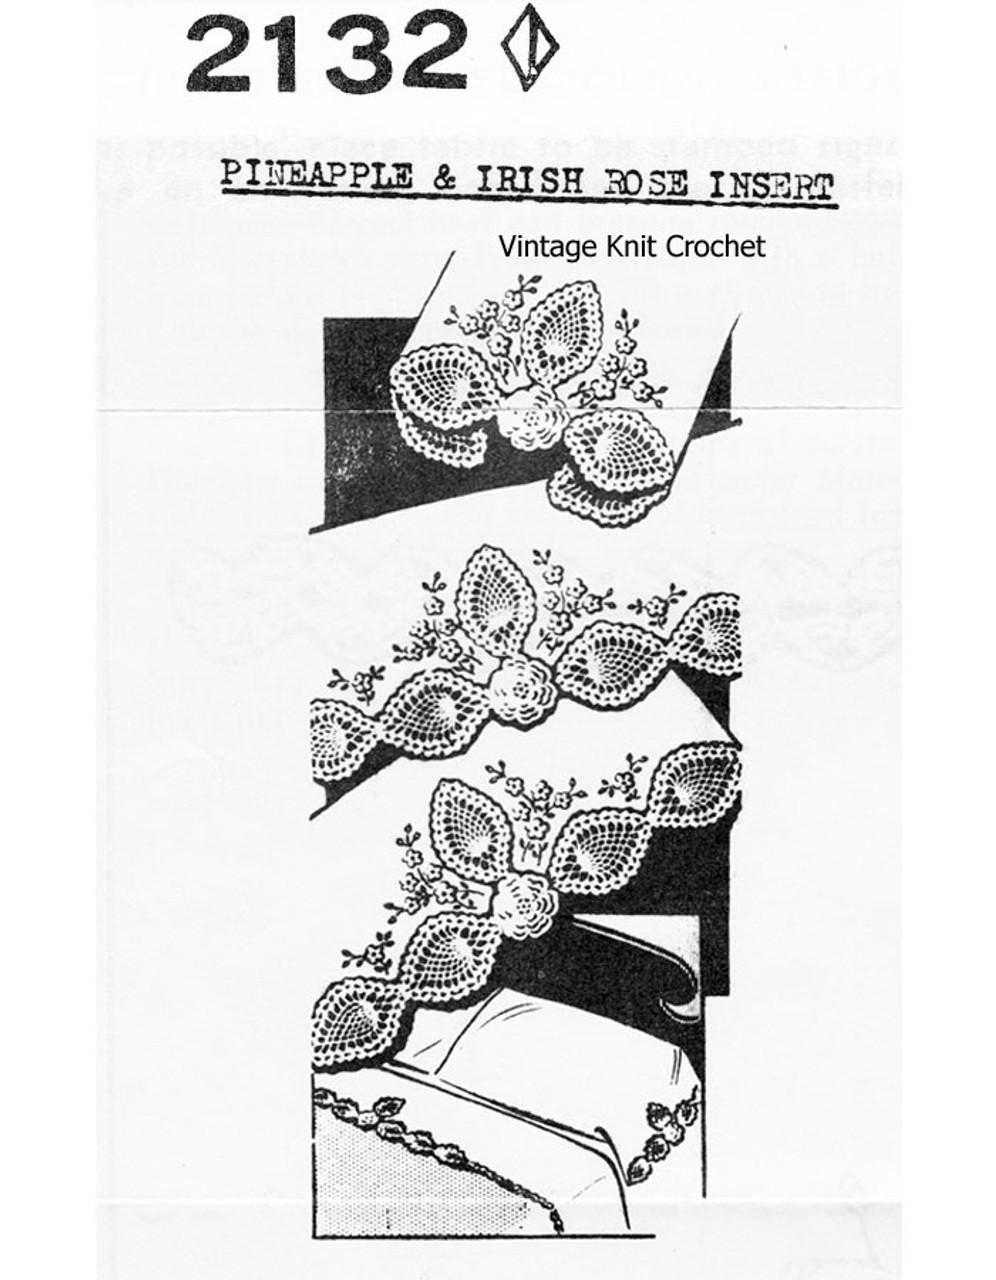 Irish Rose crochet insertion, Mail Order 2132